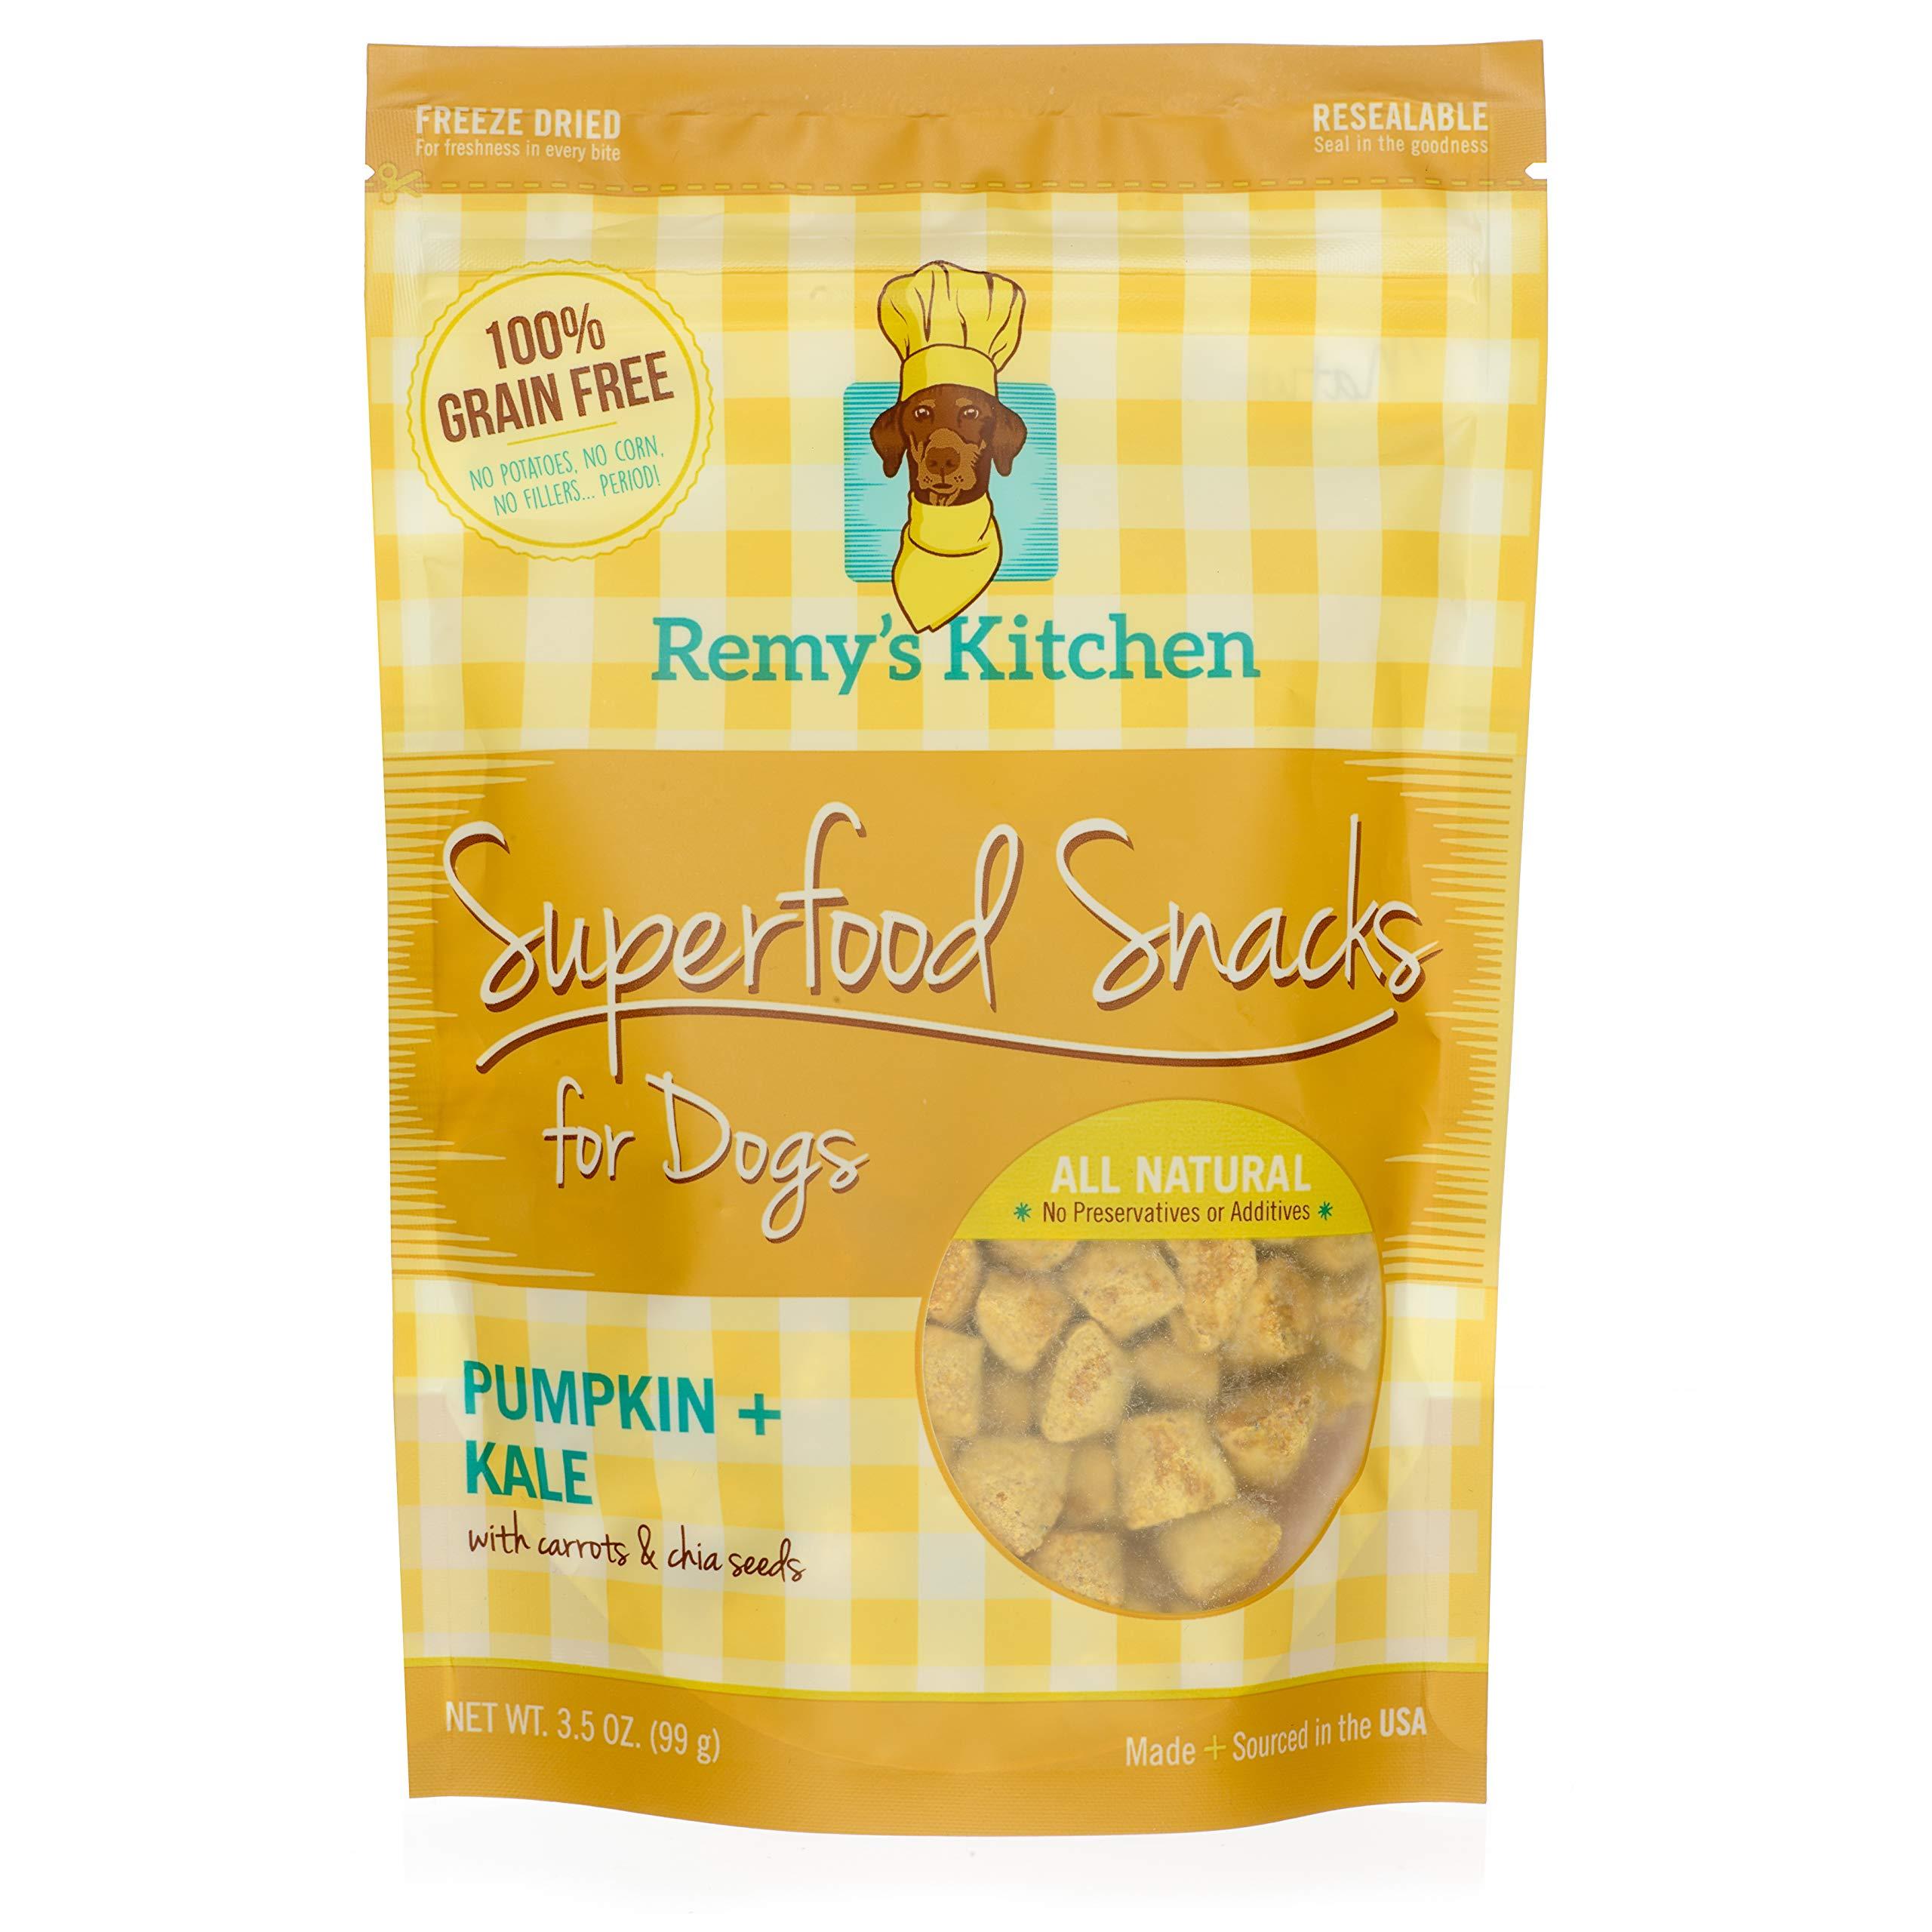 Remy's Kitchen Pumpkin Kale Superfood Snacks for Dogs, Orange, 3.5 oz